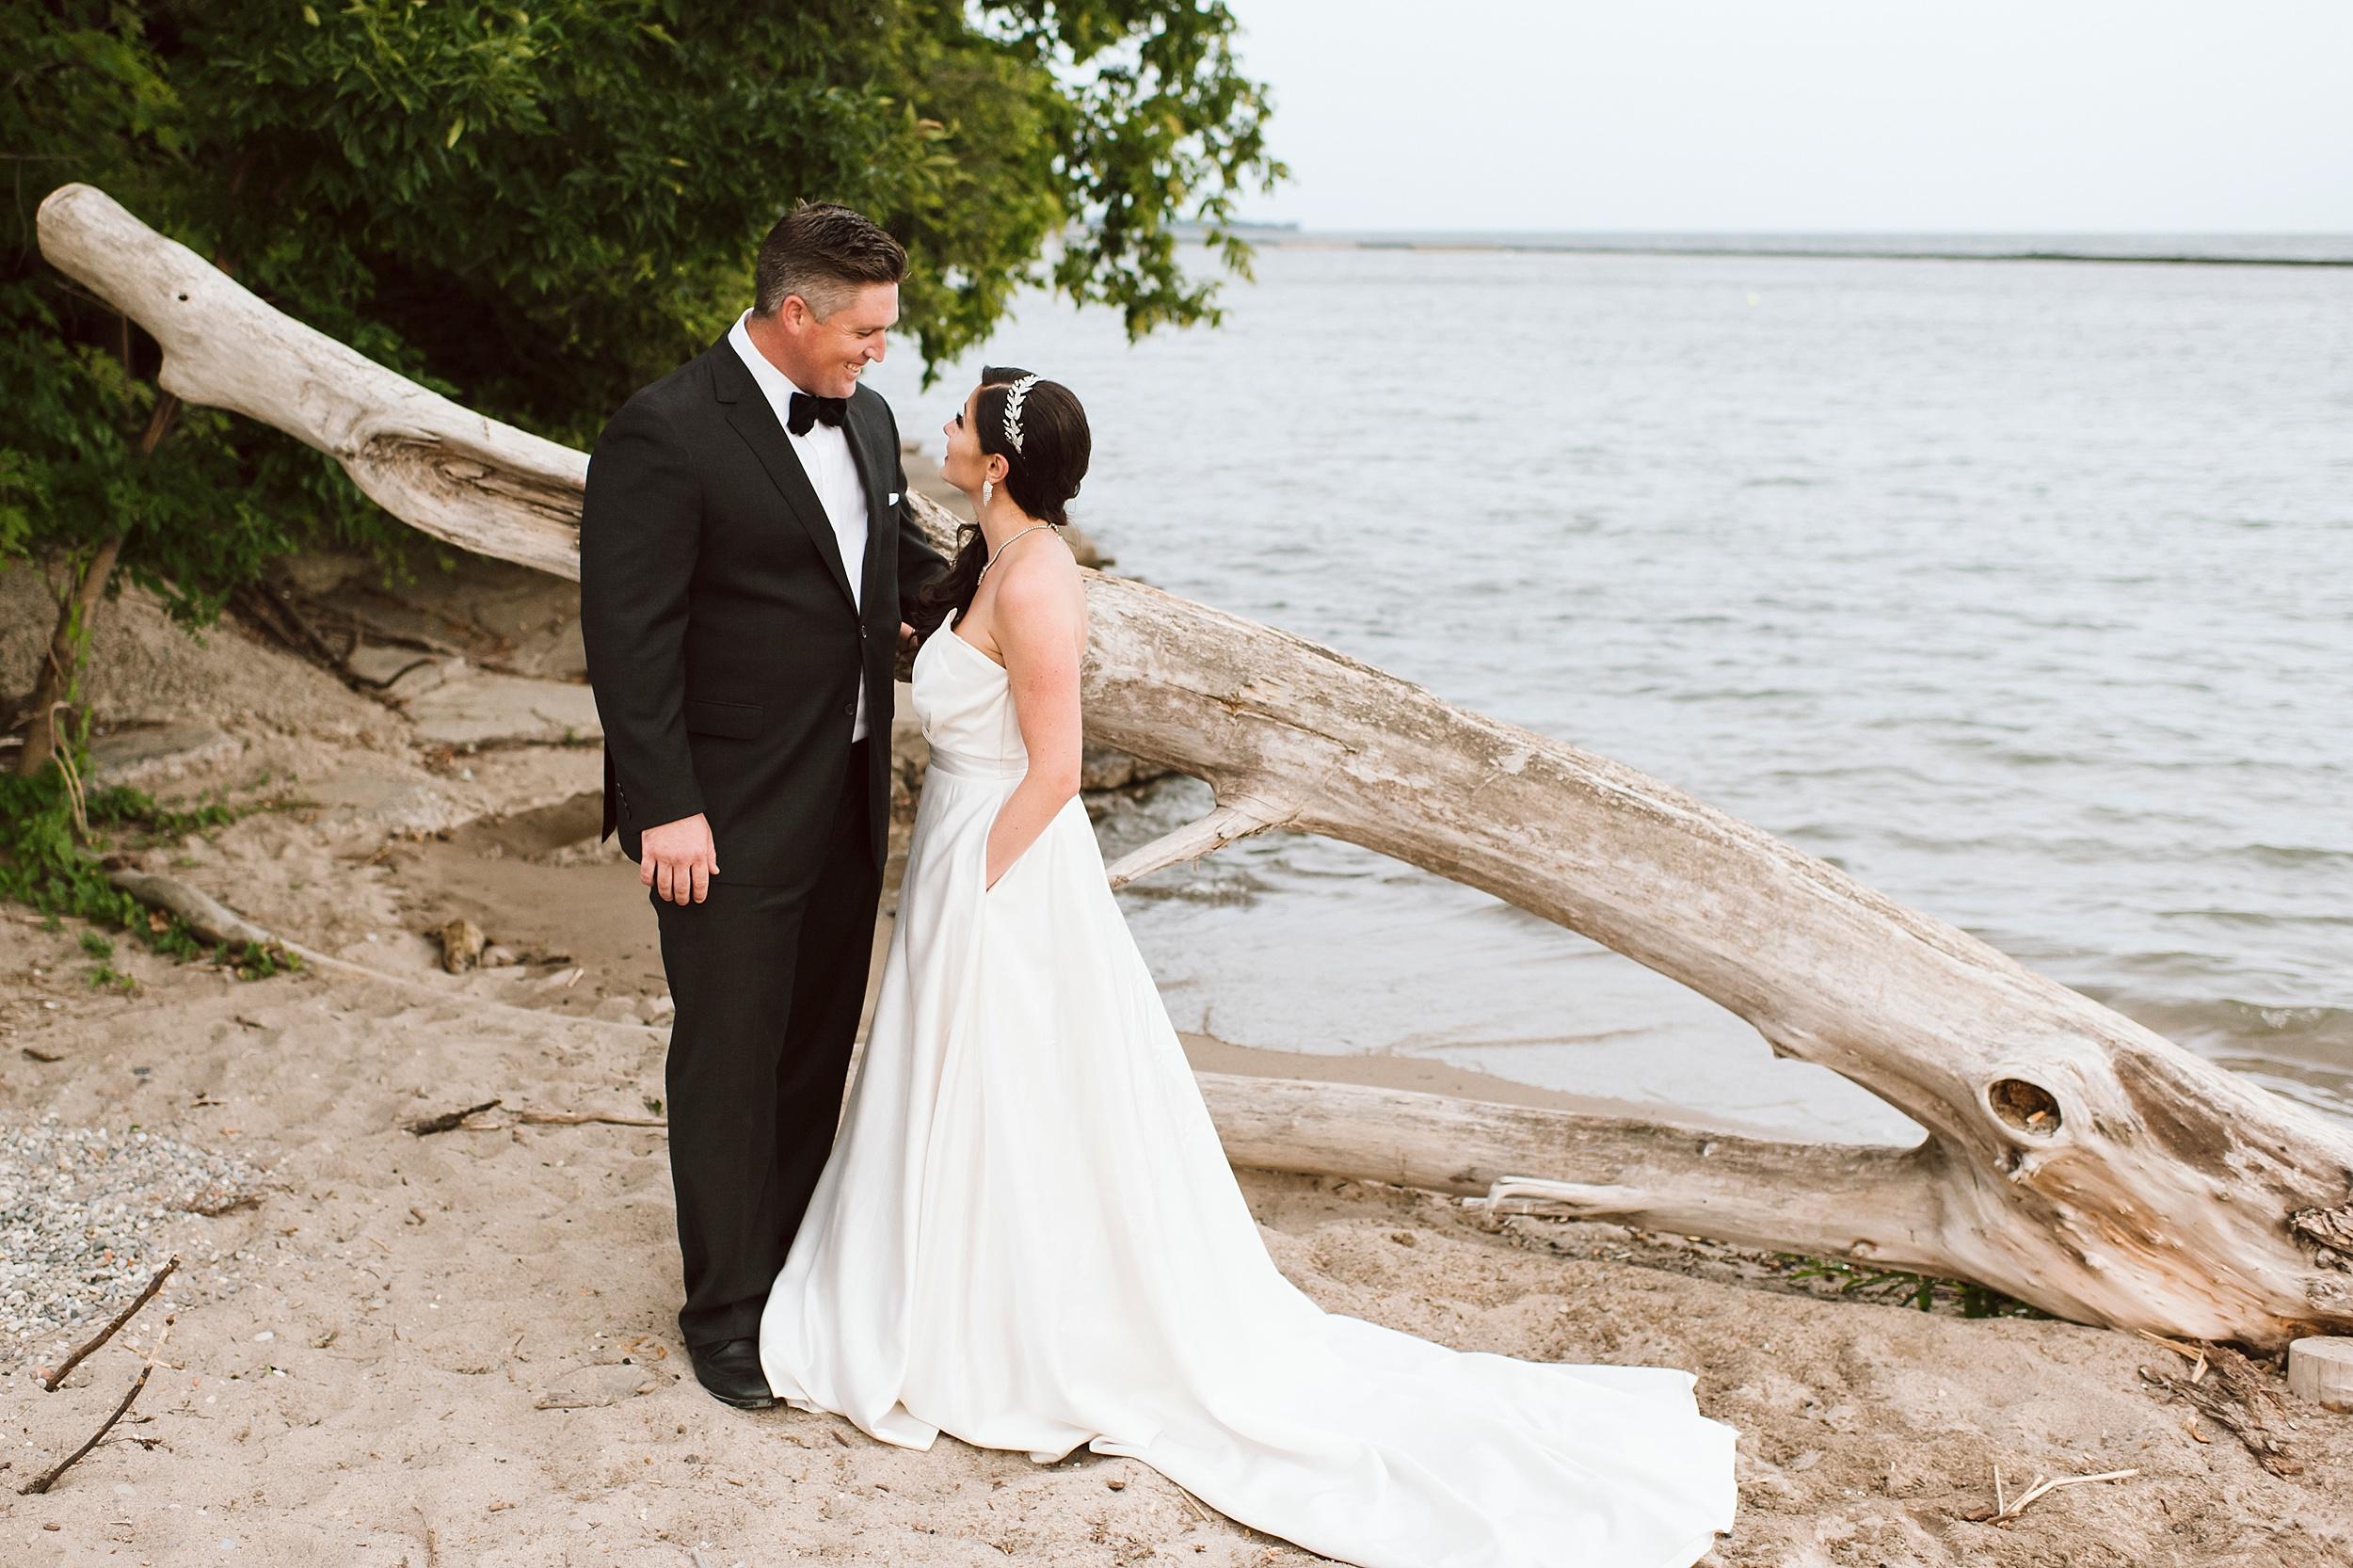 Sunnyside_Pavilion_Wedding_Toronto_Photographer_0070.jpg